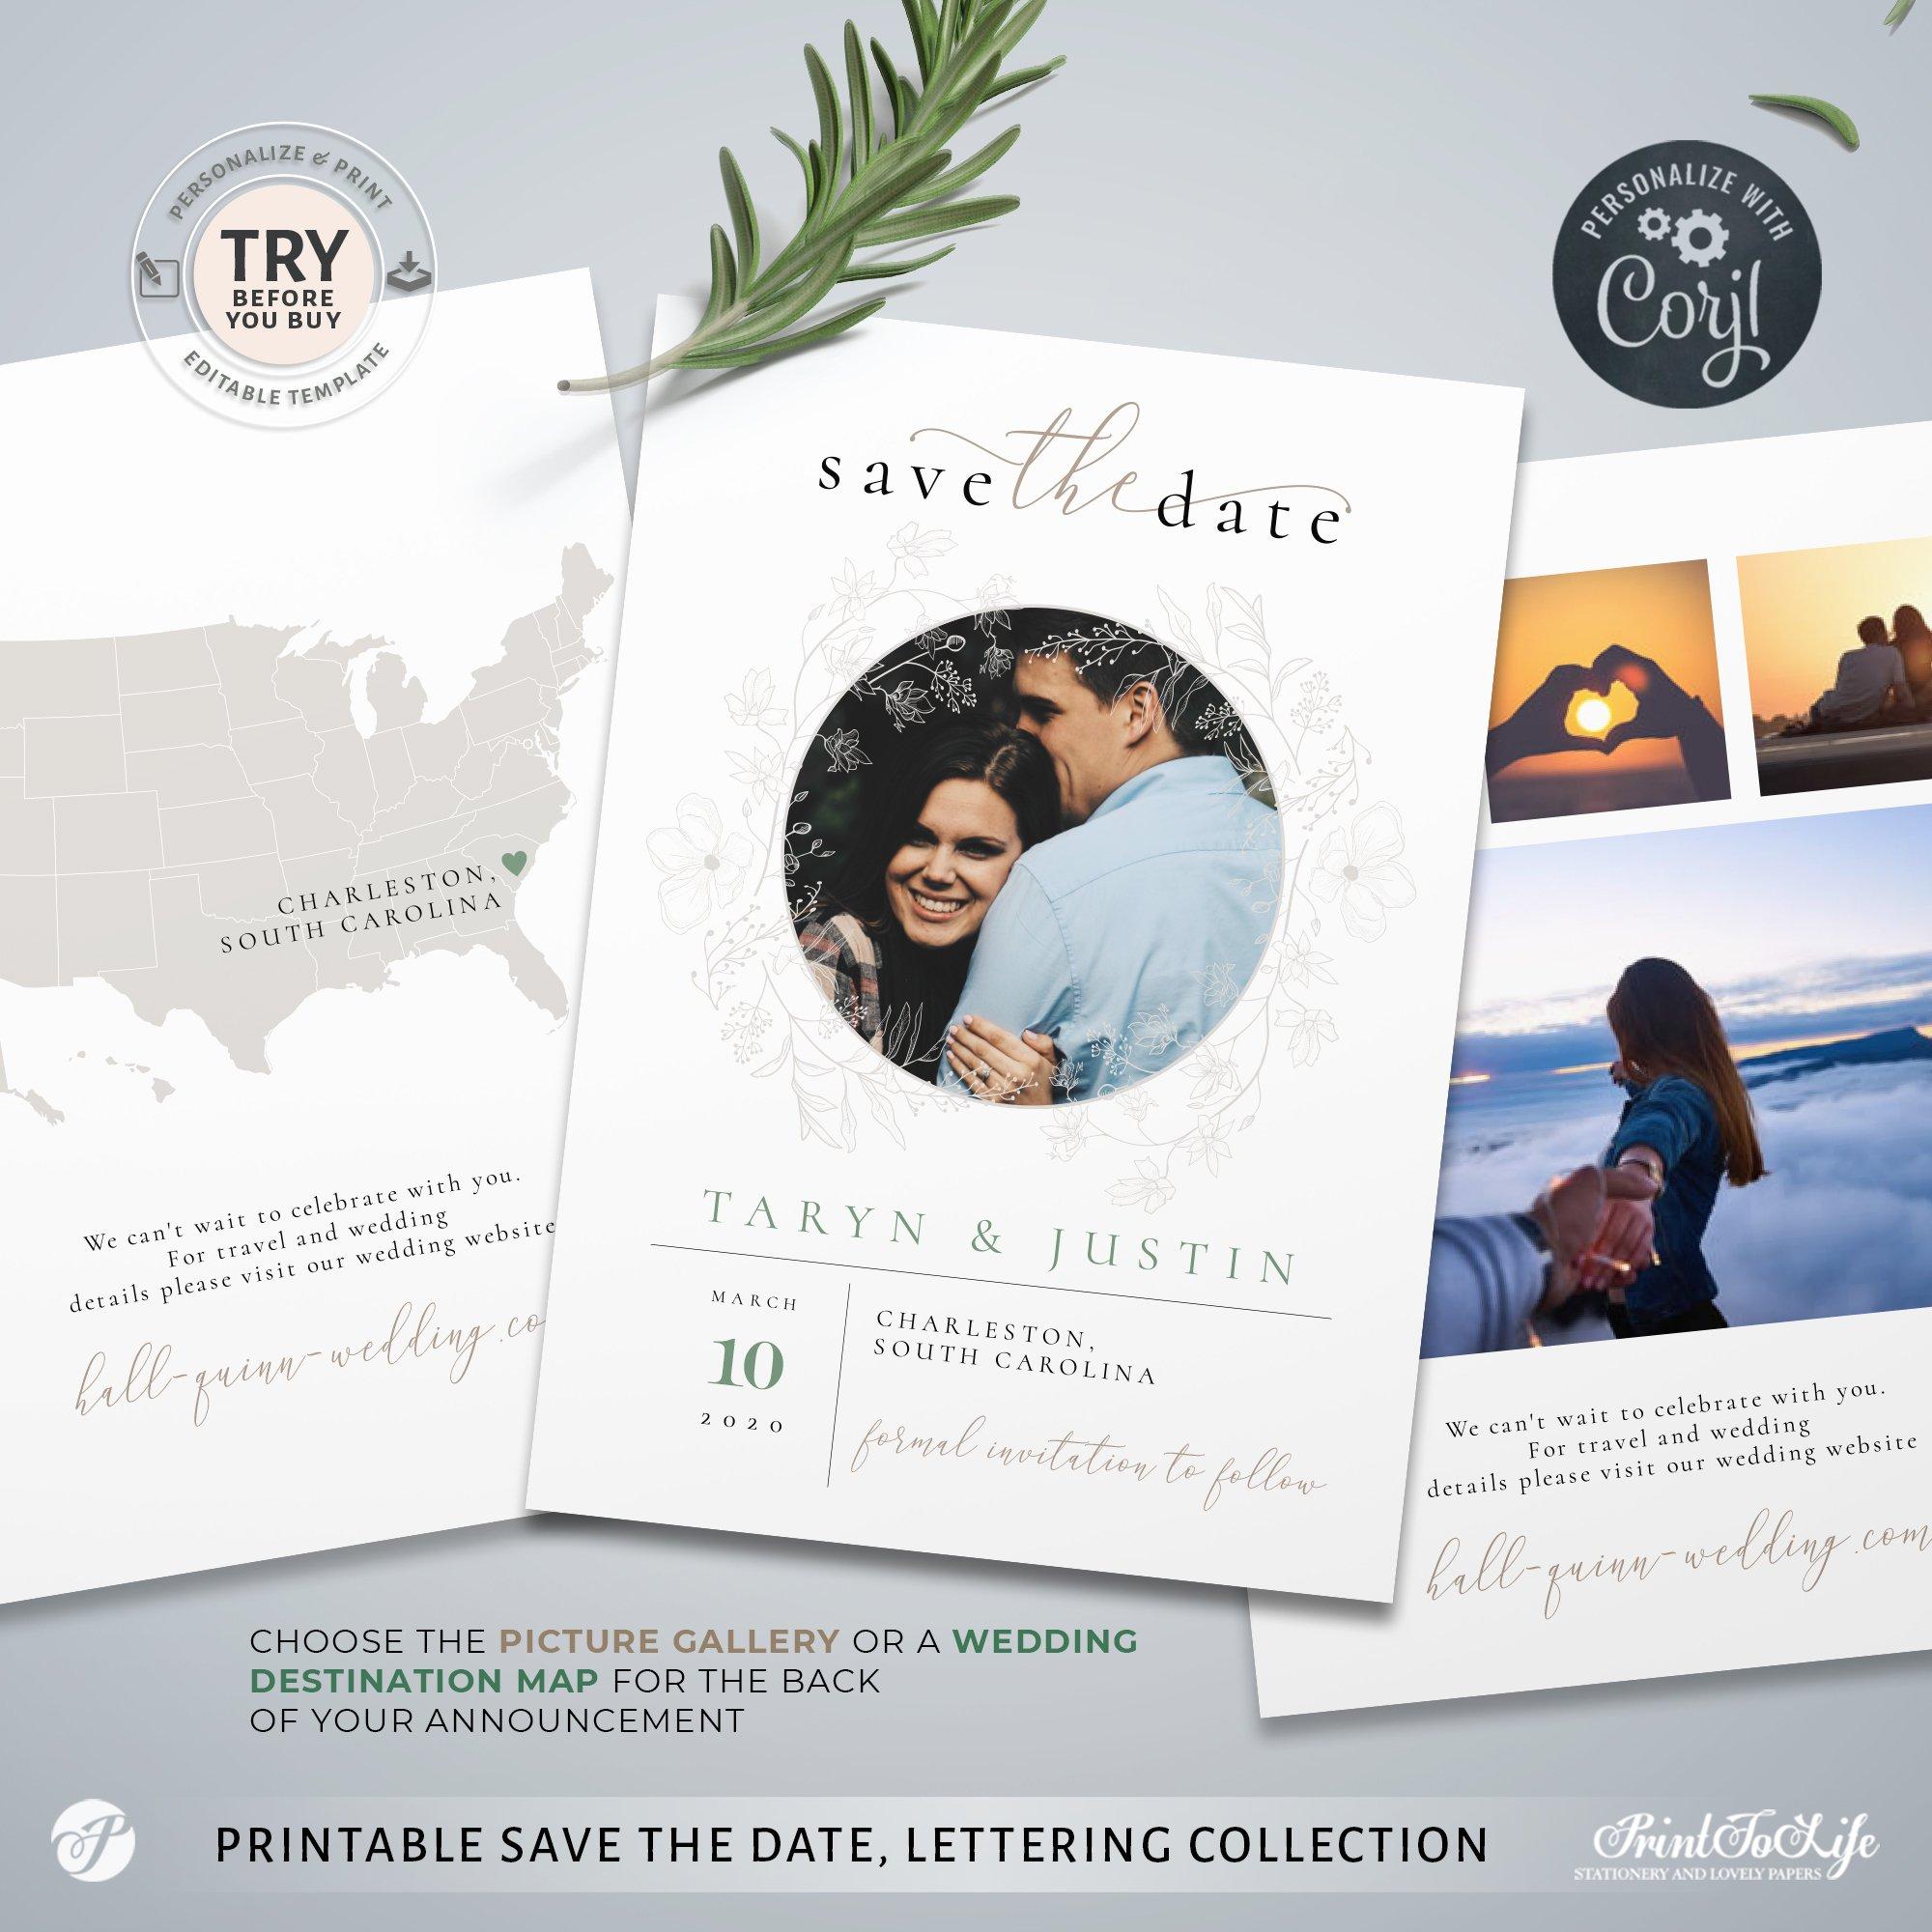 Save the Date Wedding Destination